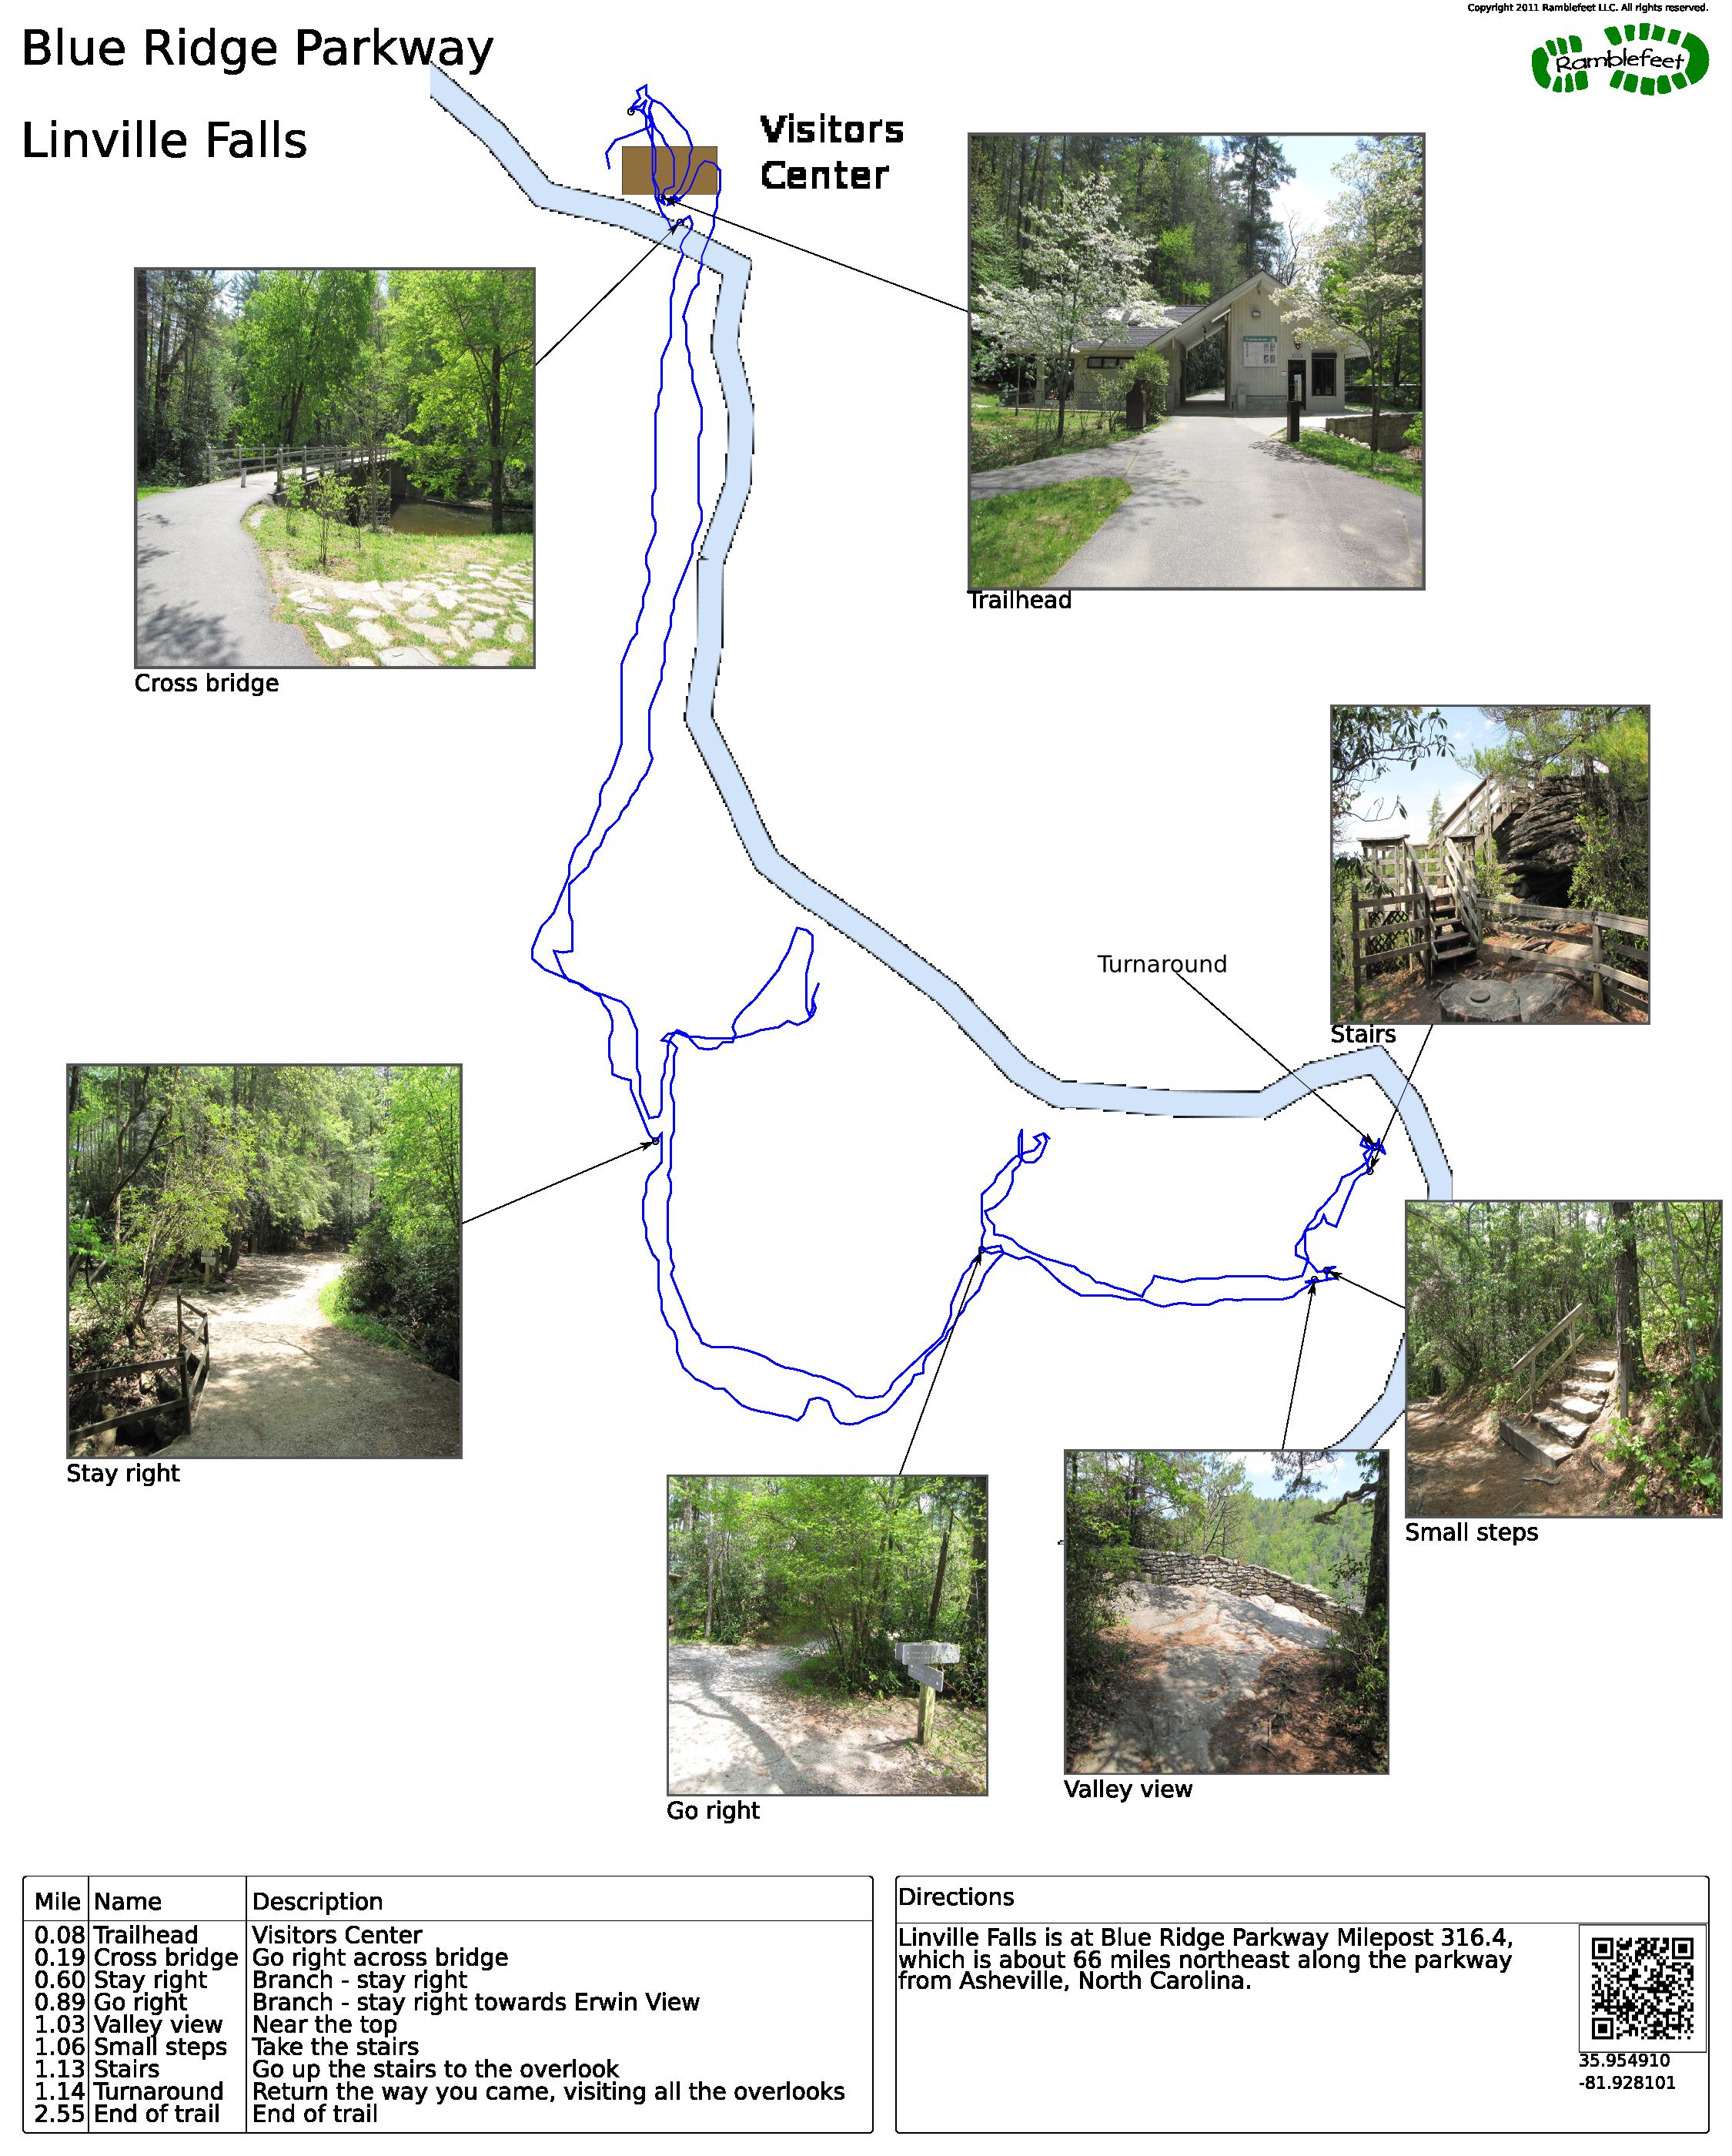 Blue Ridge Parkway Linville Falls